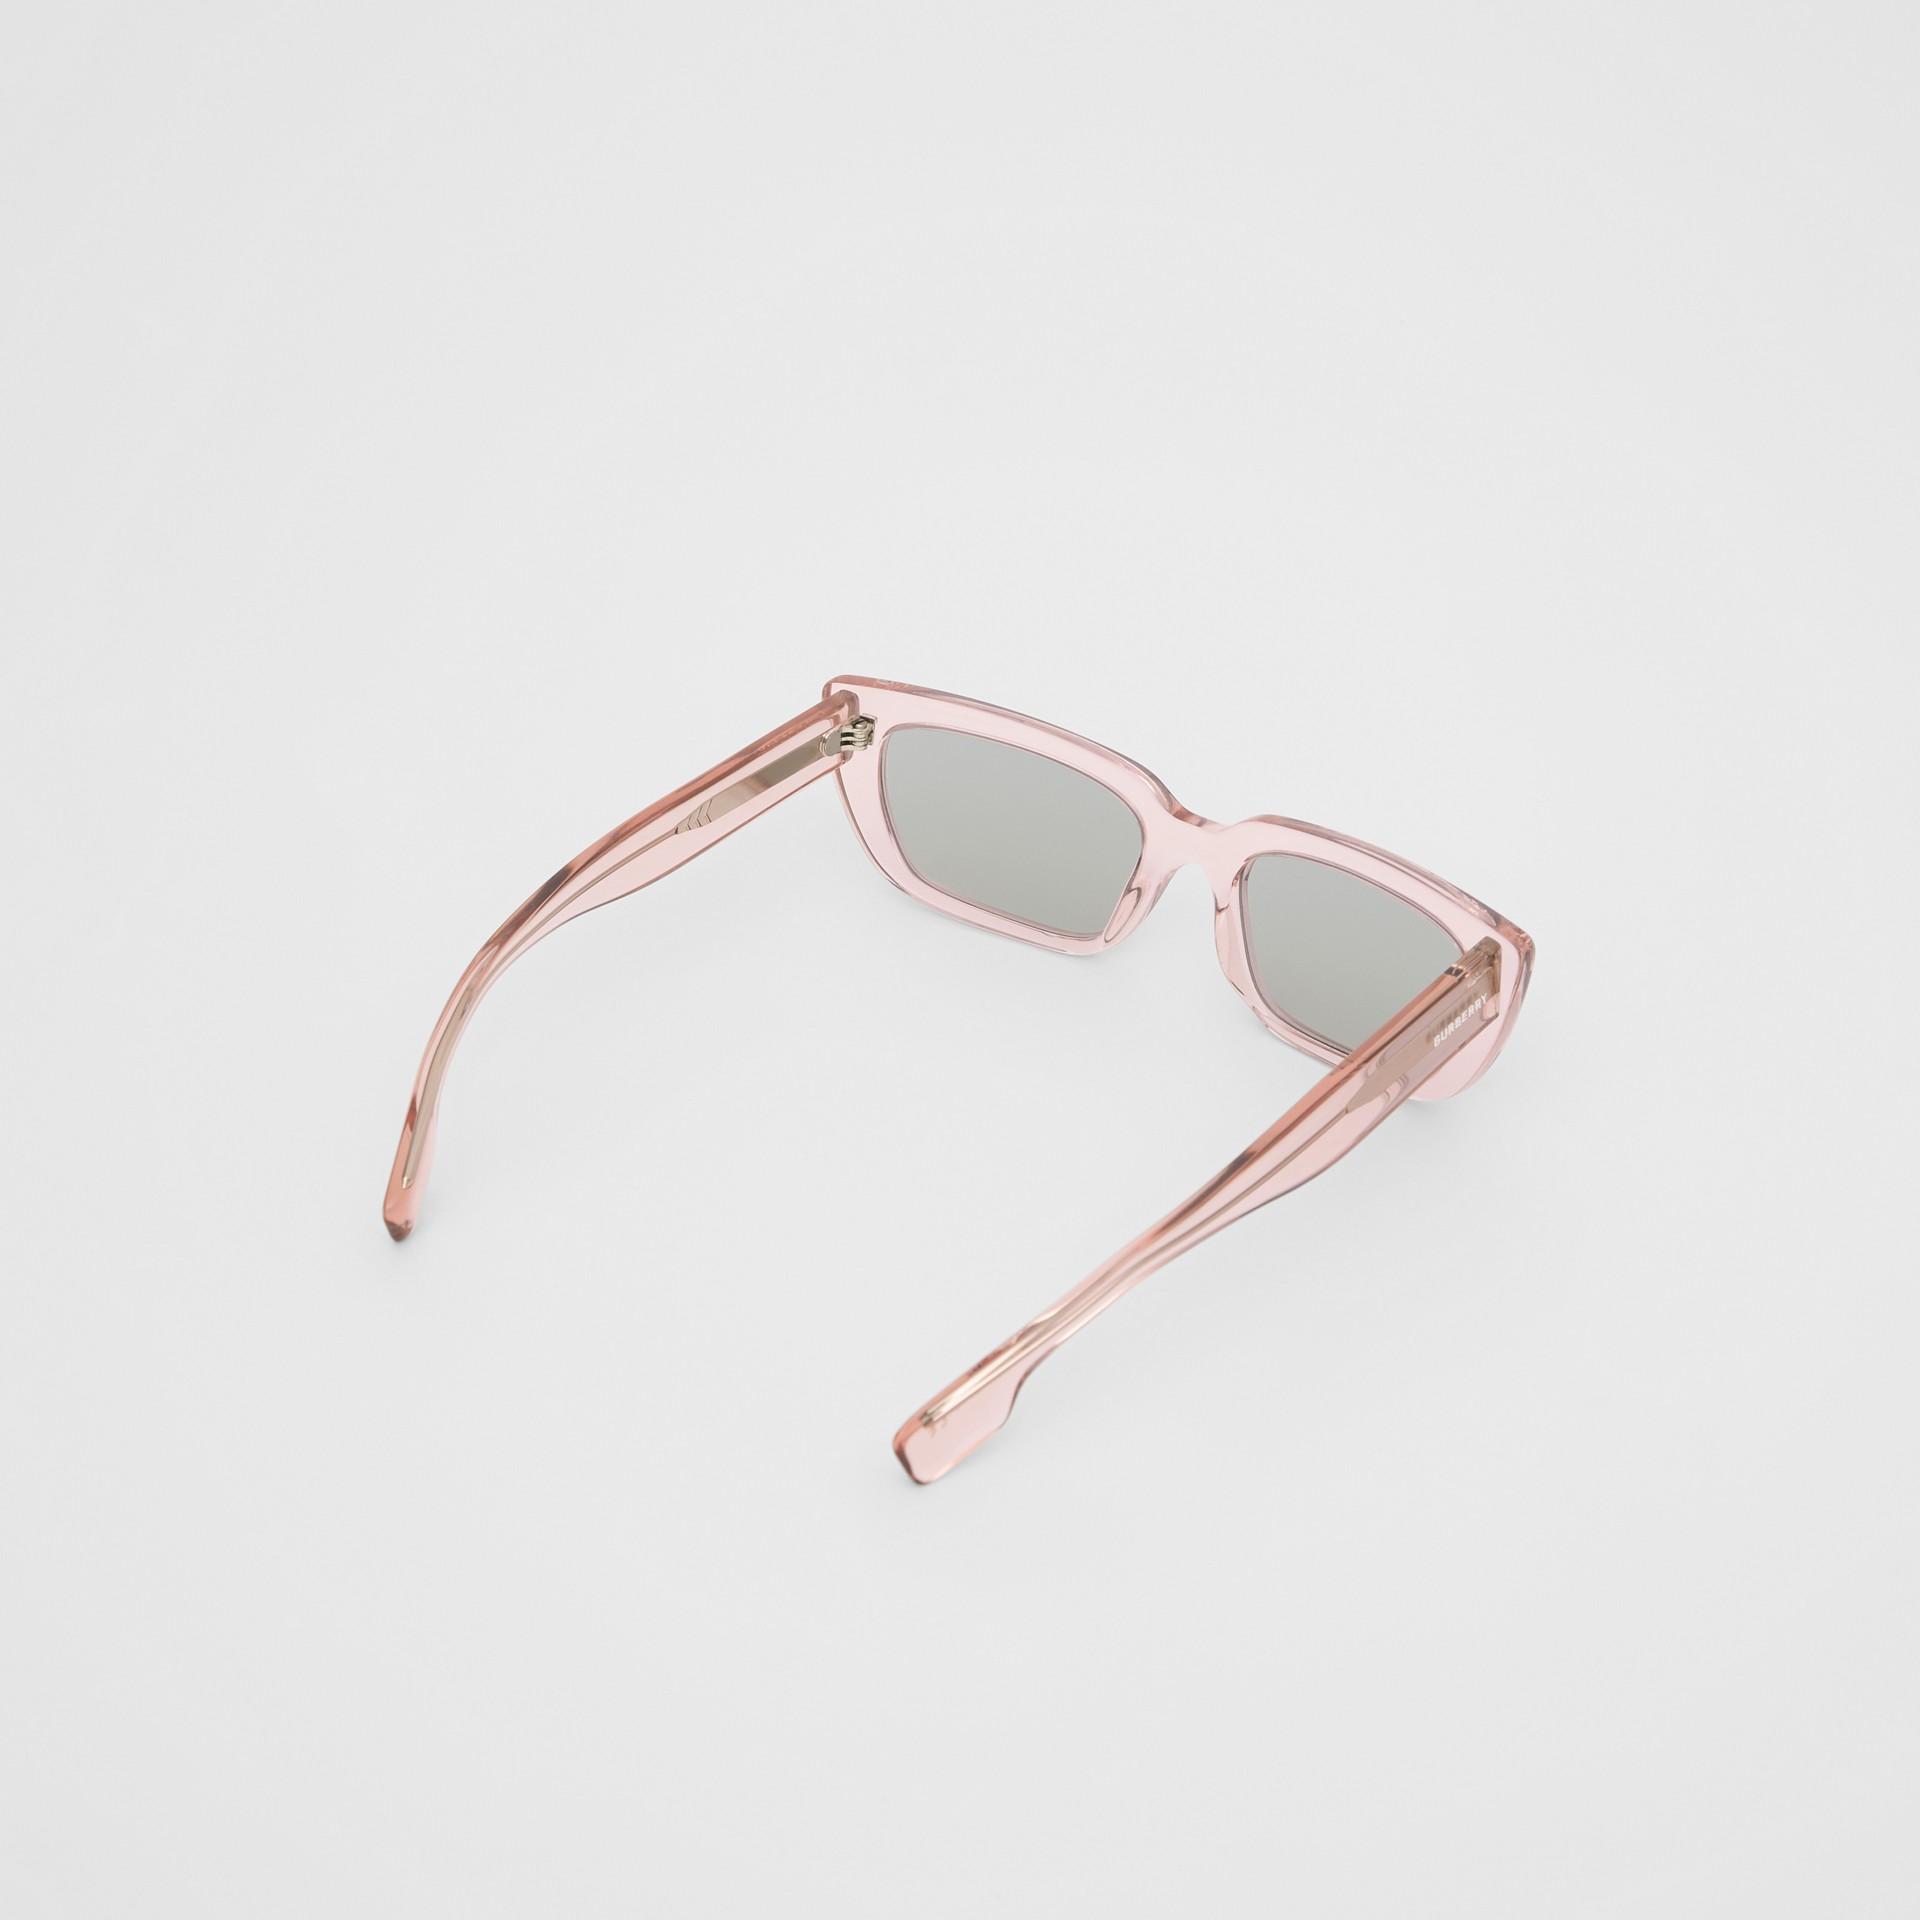 Bio-acetate Rectangular Frame Sunglasses in Light Pink - Women | Burberry - gallery image 4